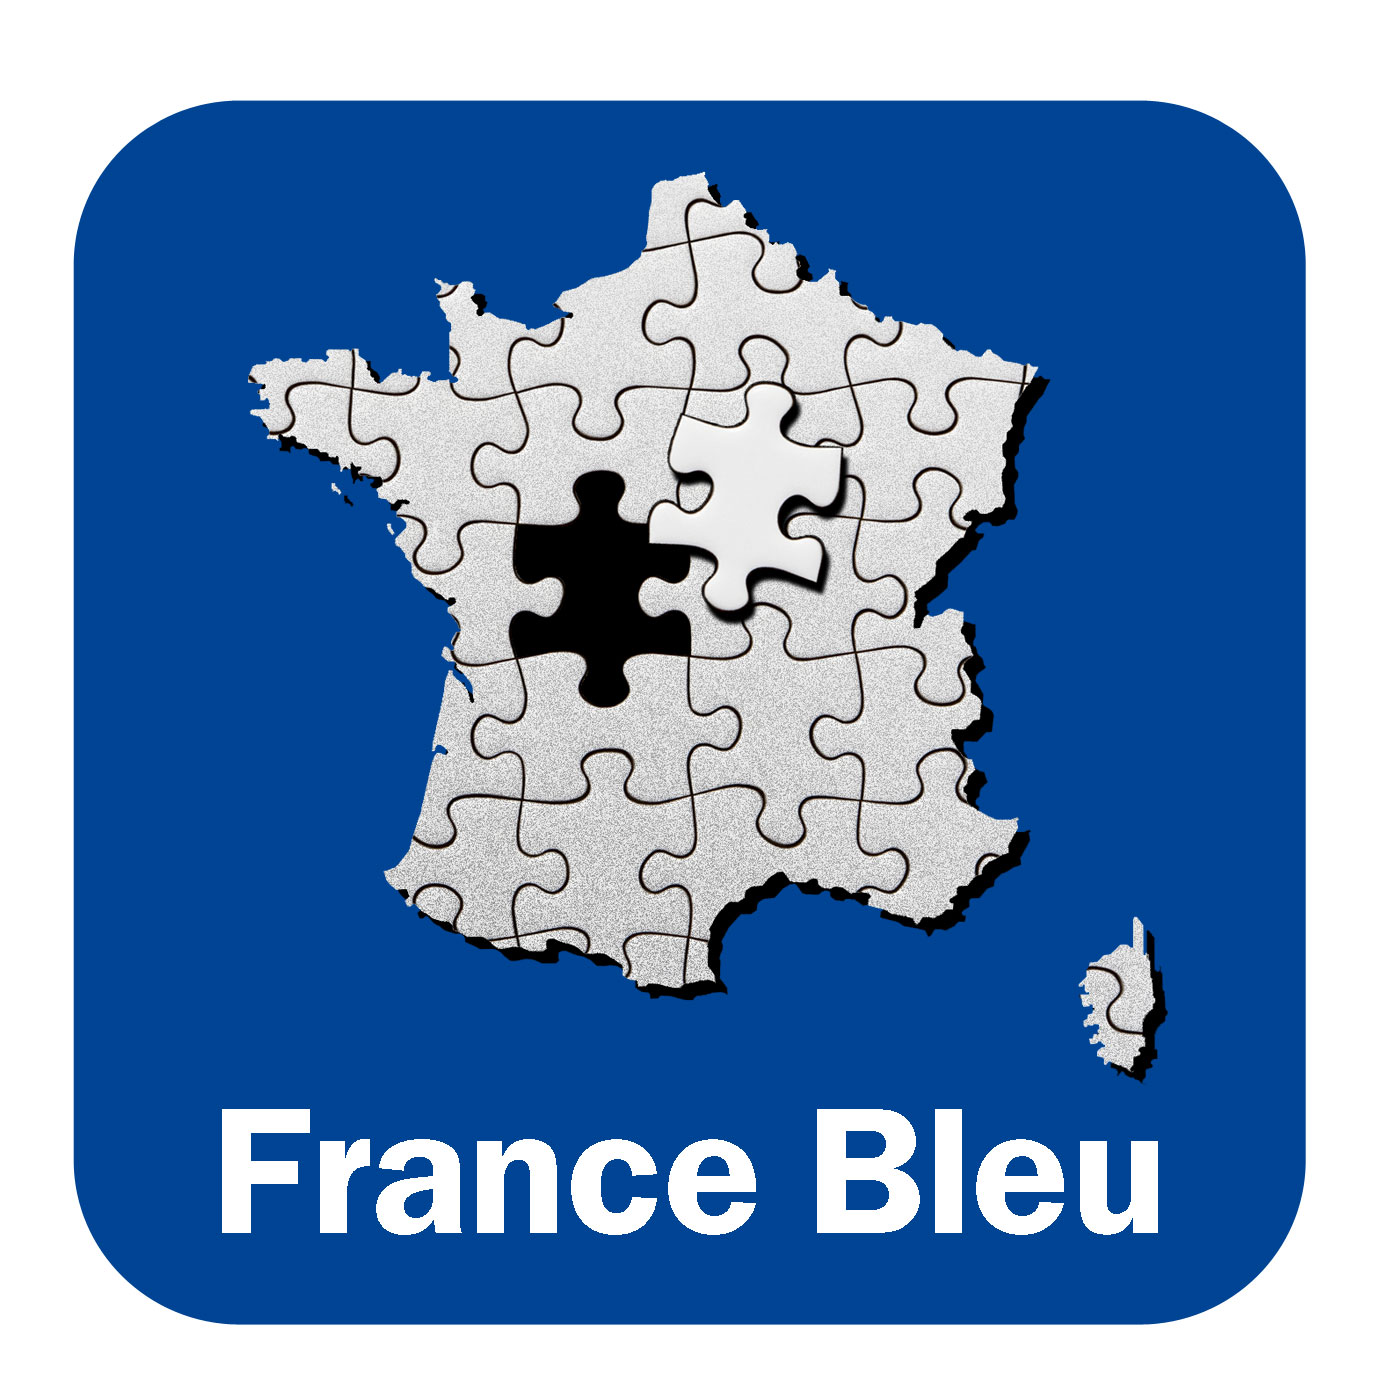 De bouche à oreille France Bleu Breizh Izel